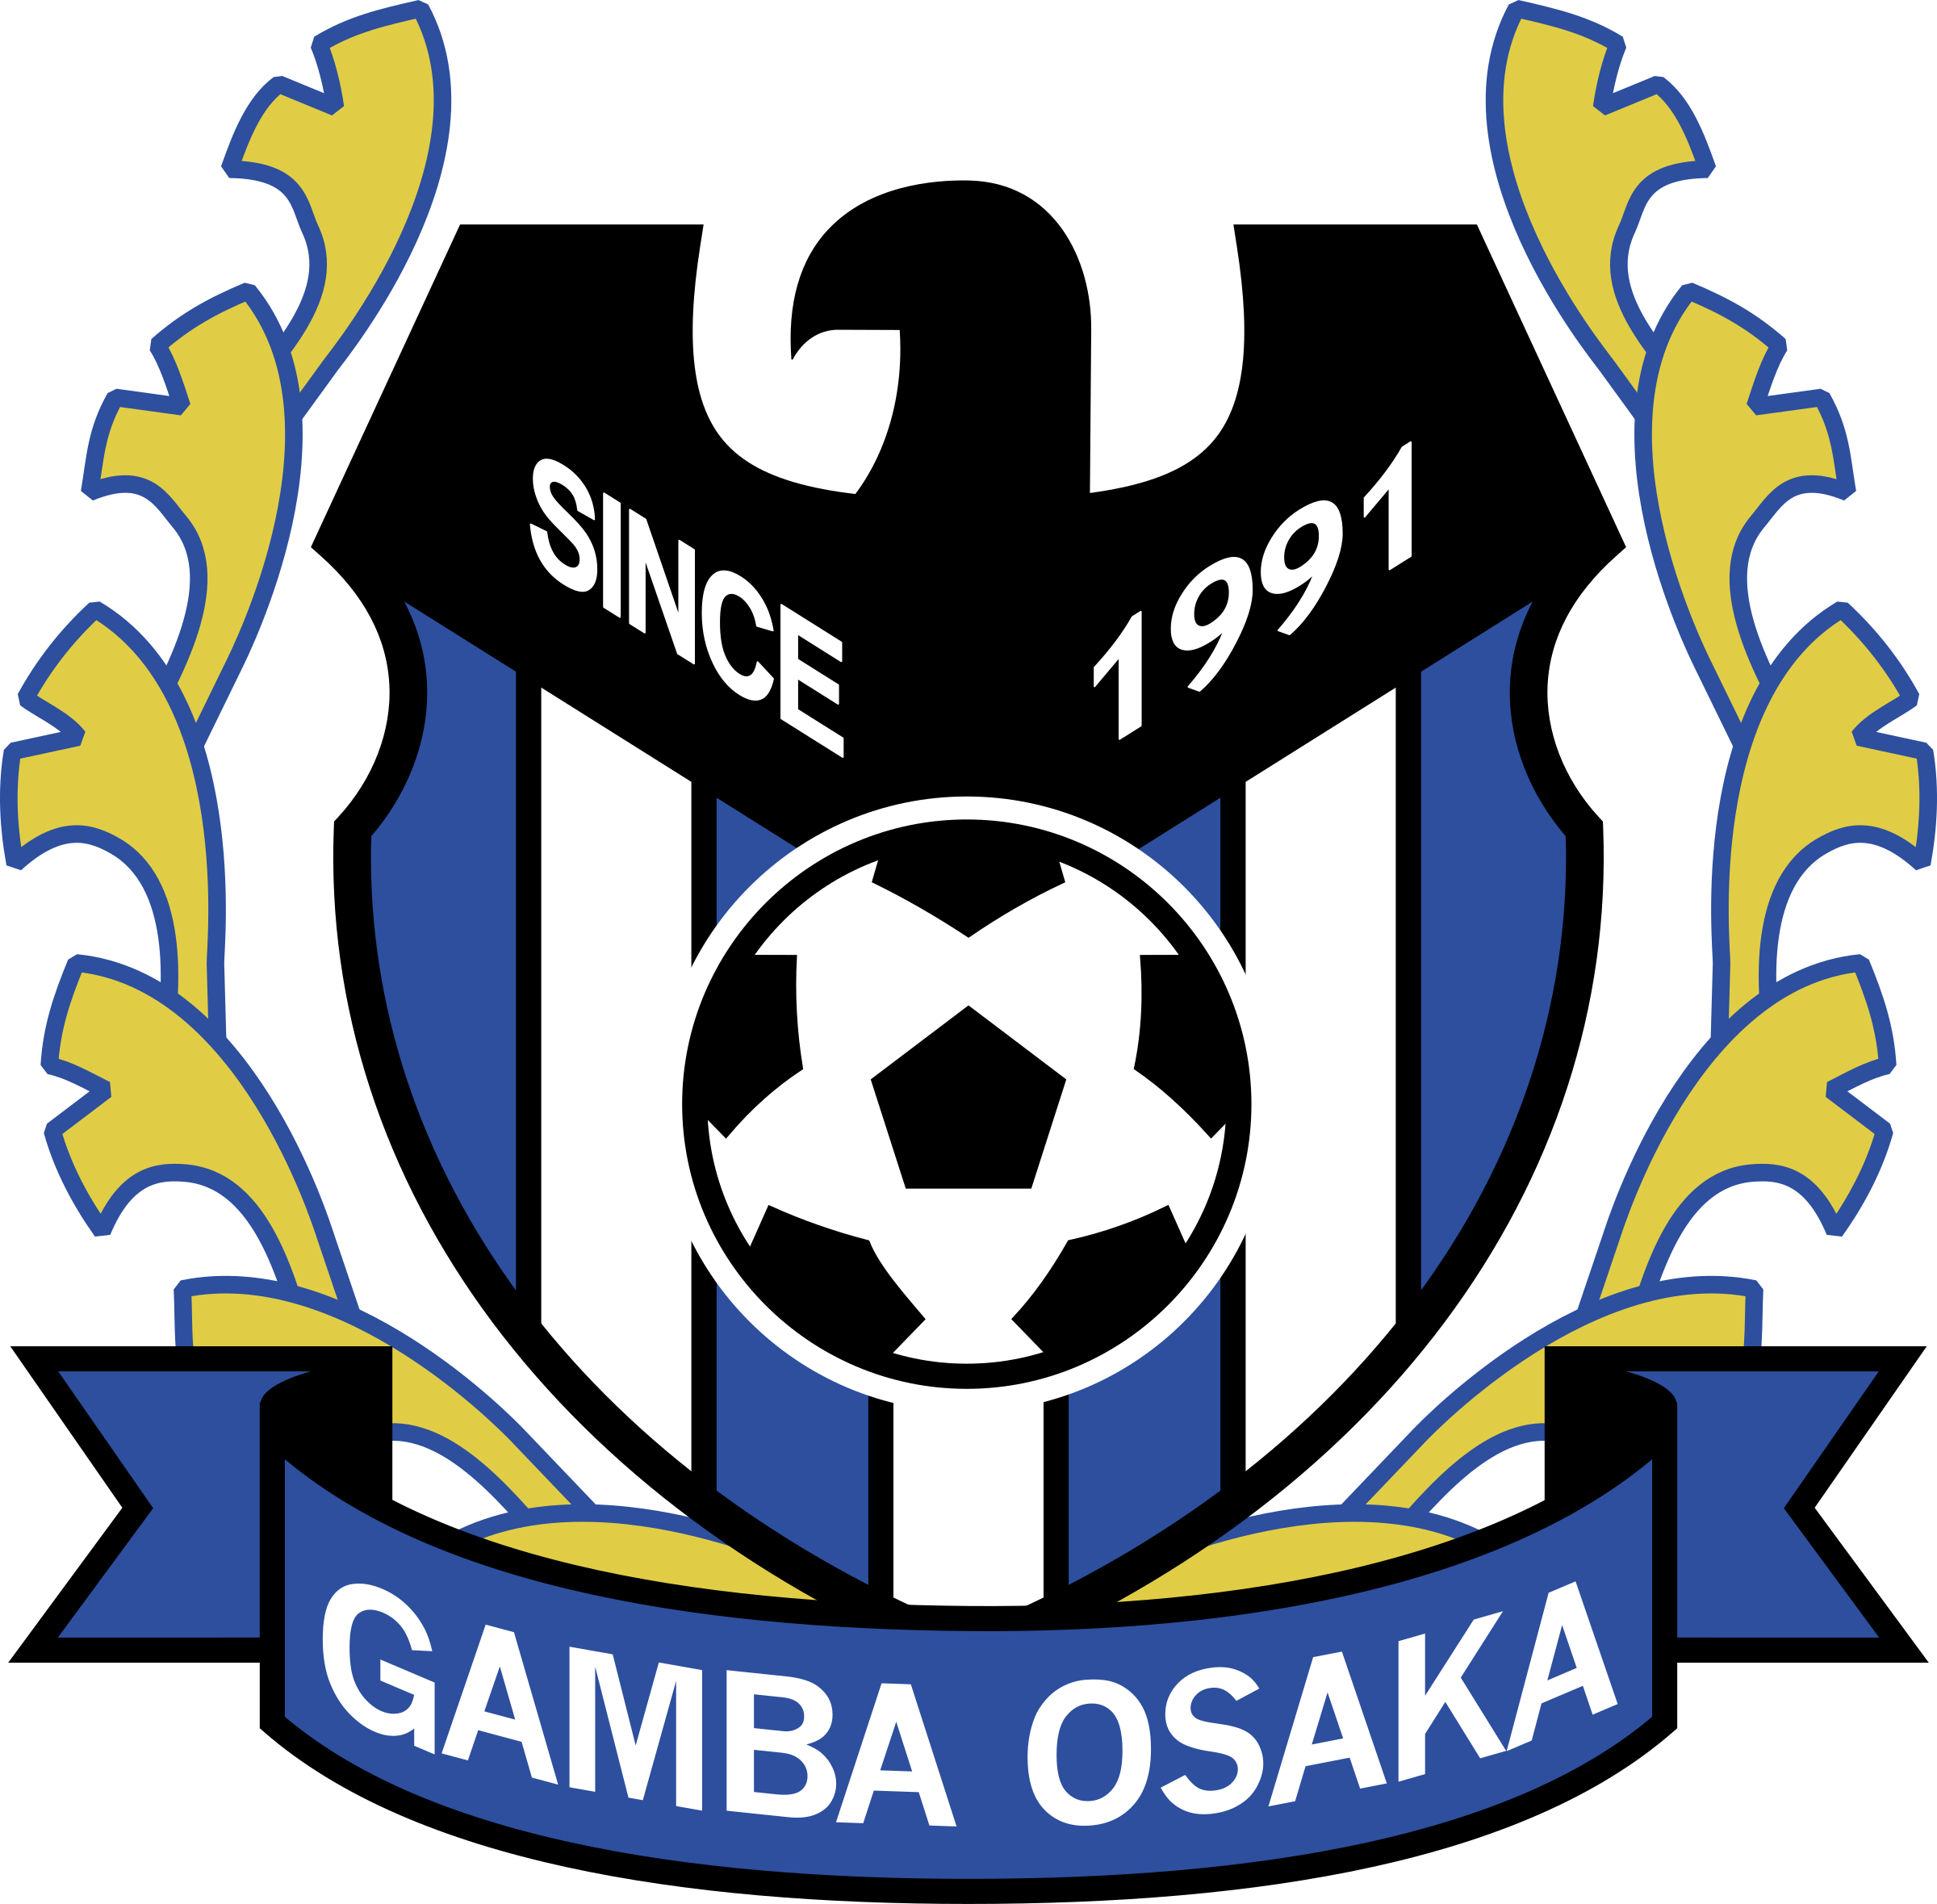 jpg download Vector crest logos. Gambao logo png transparent